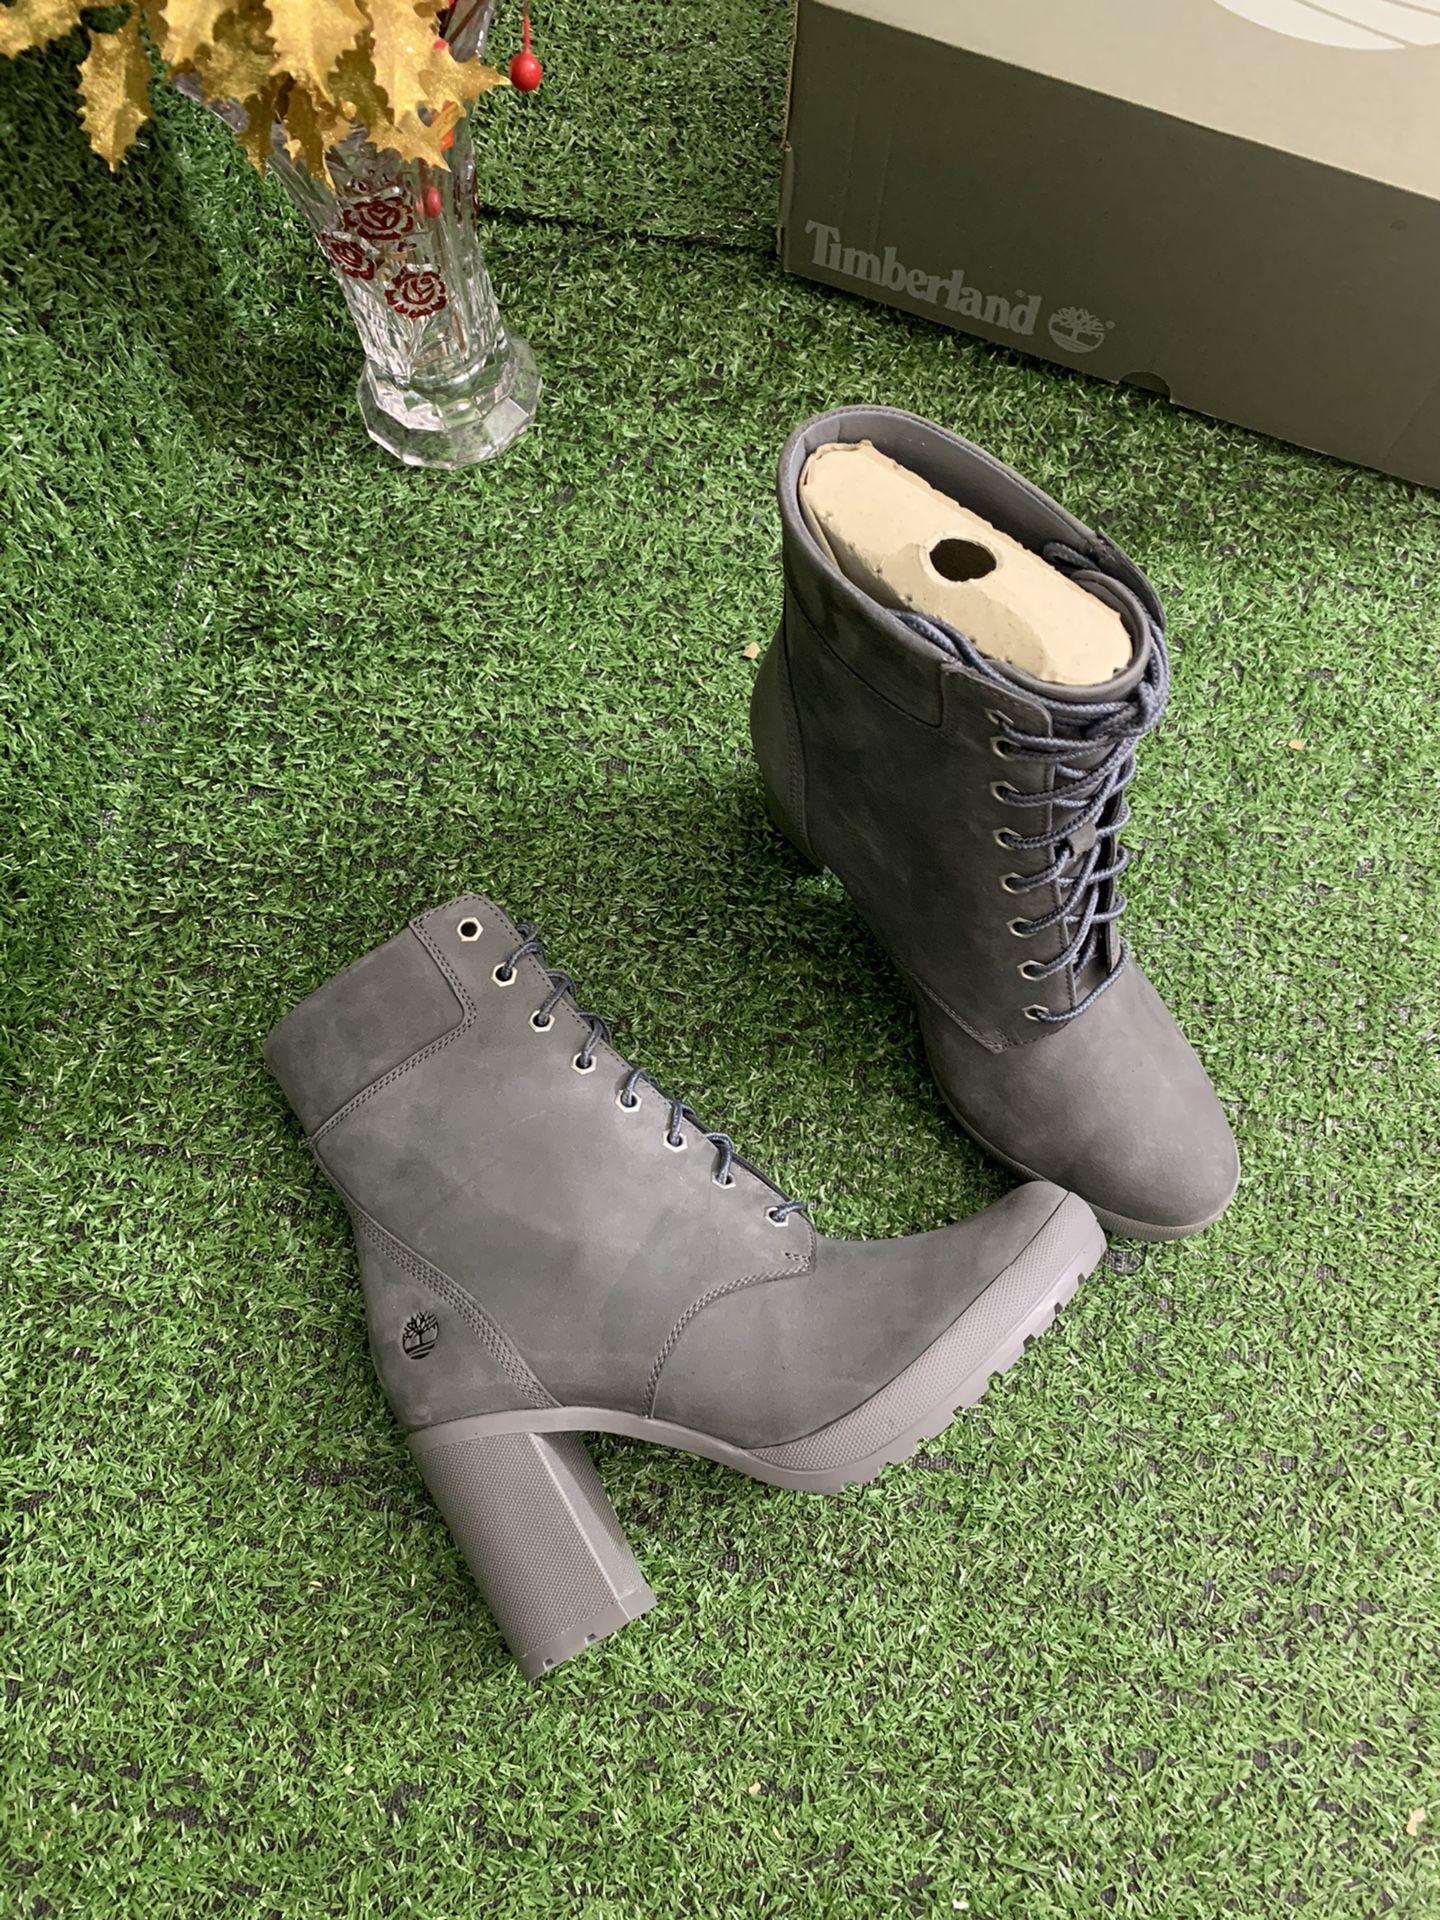 Timberland Women's Camdale Boot